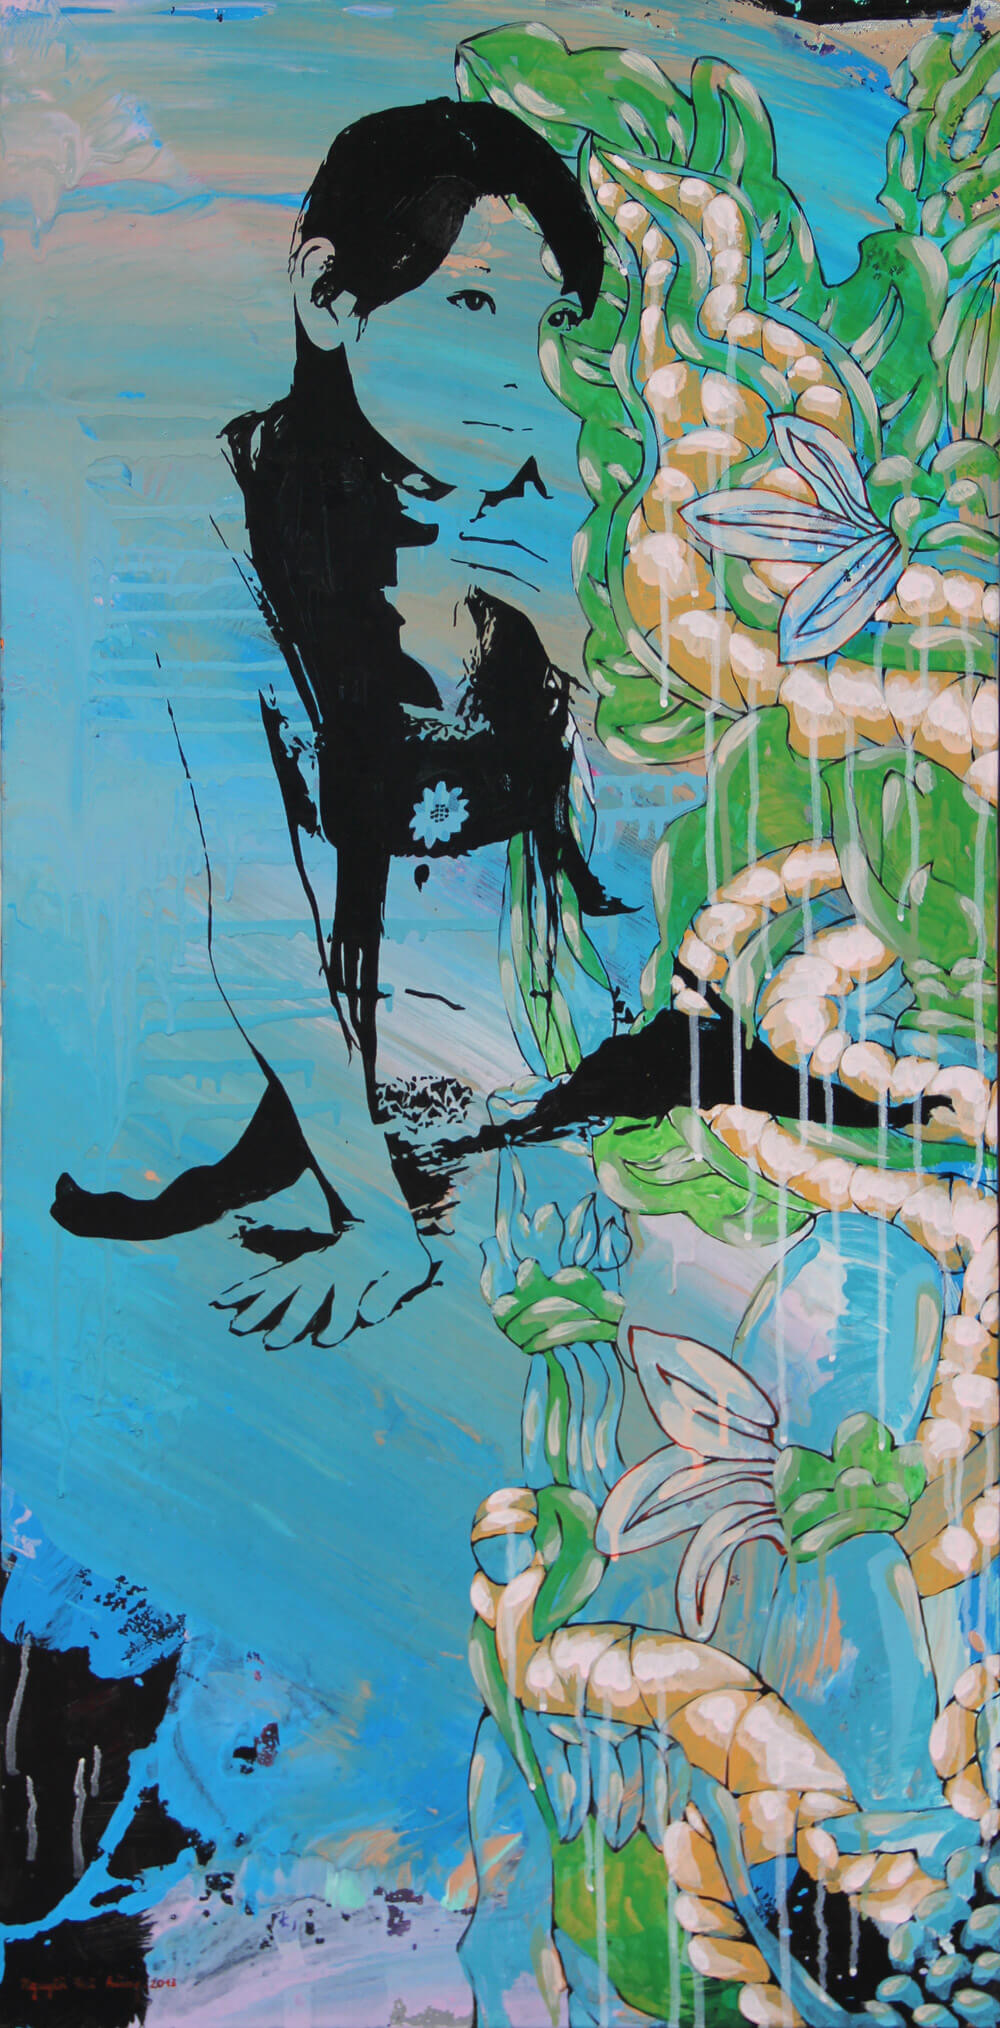 Lady 02, Vietnam Artworks